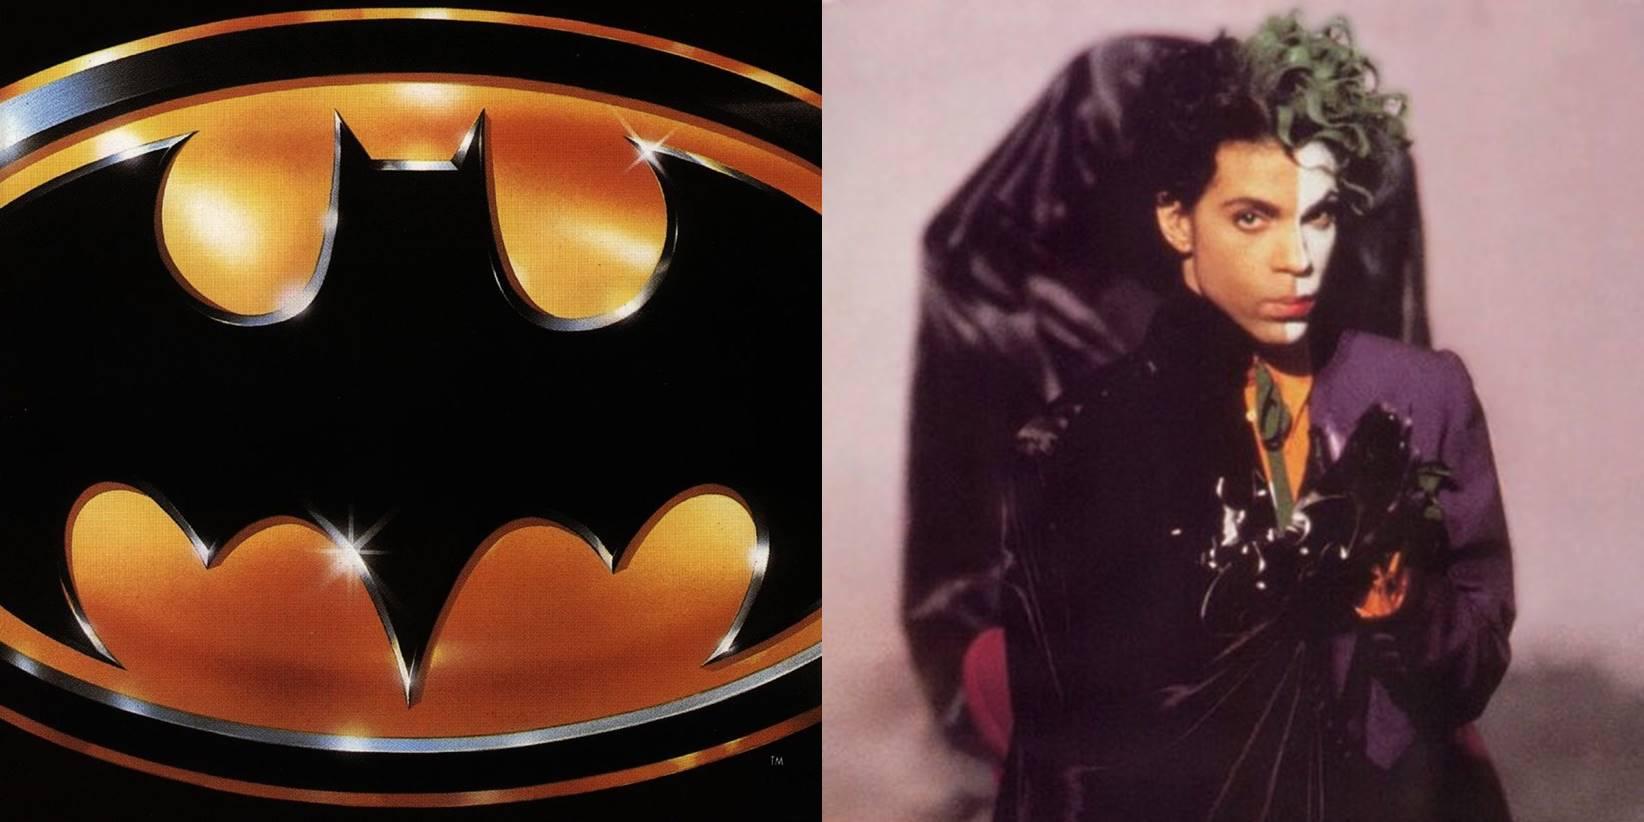 Albumism_Prince_Batman_MainImage1.jpg?format=2500w